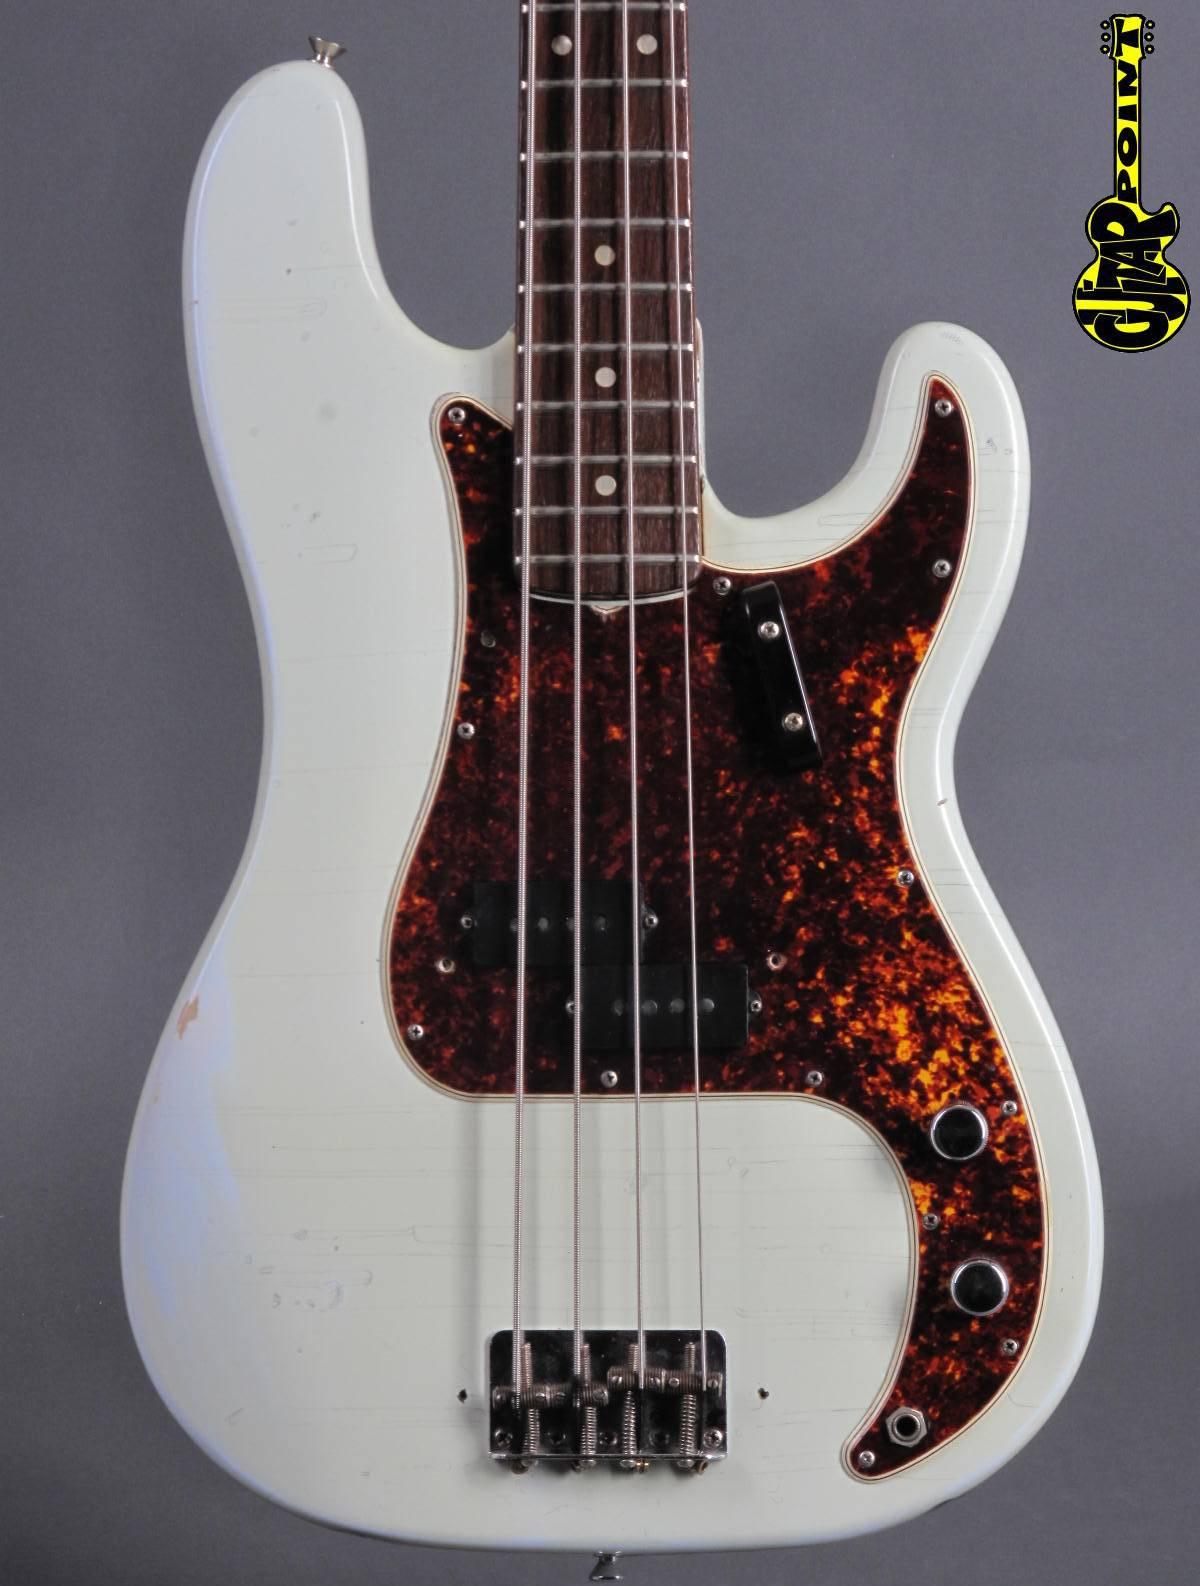 1968 Fender Precision Bass - Sonic Blue (refin.)